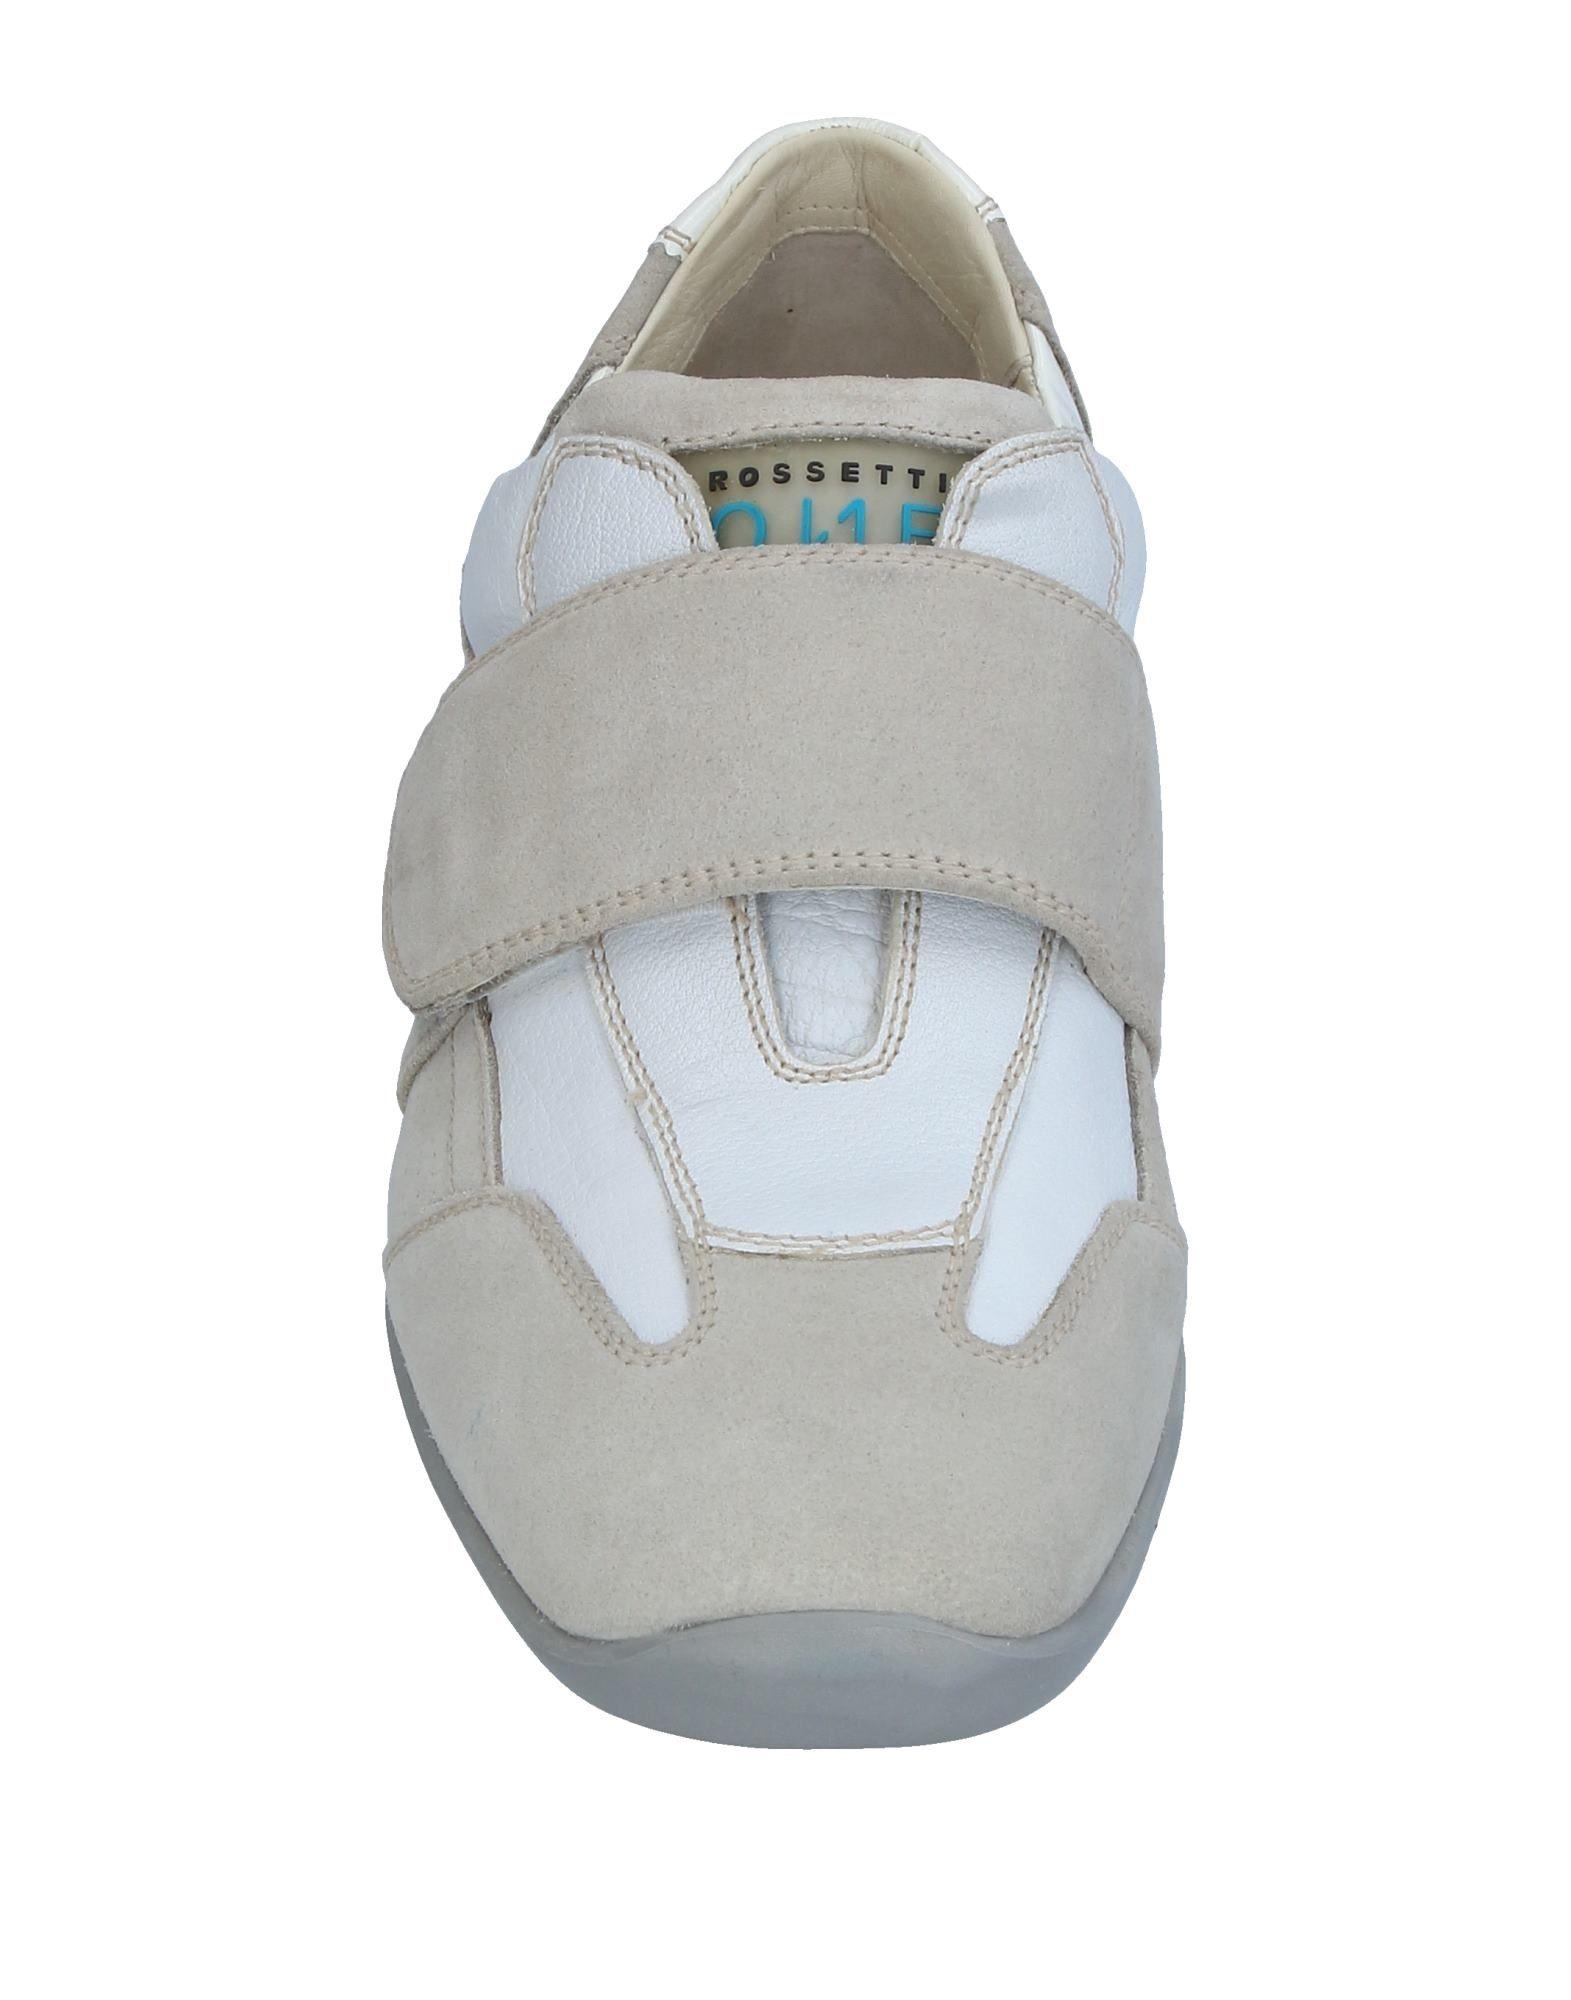 Sneakers Fratelli Rossetti Homme - Sneakers Fratelli Rossetti sur